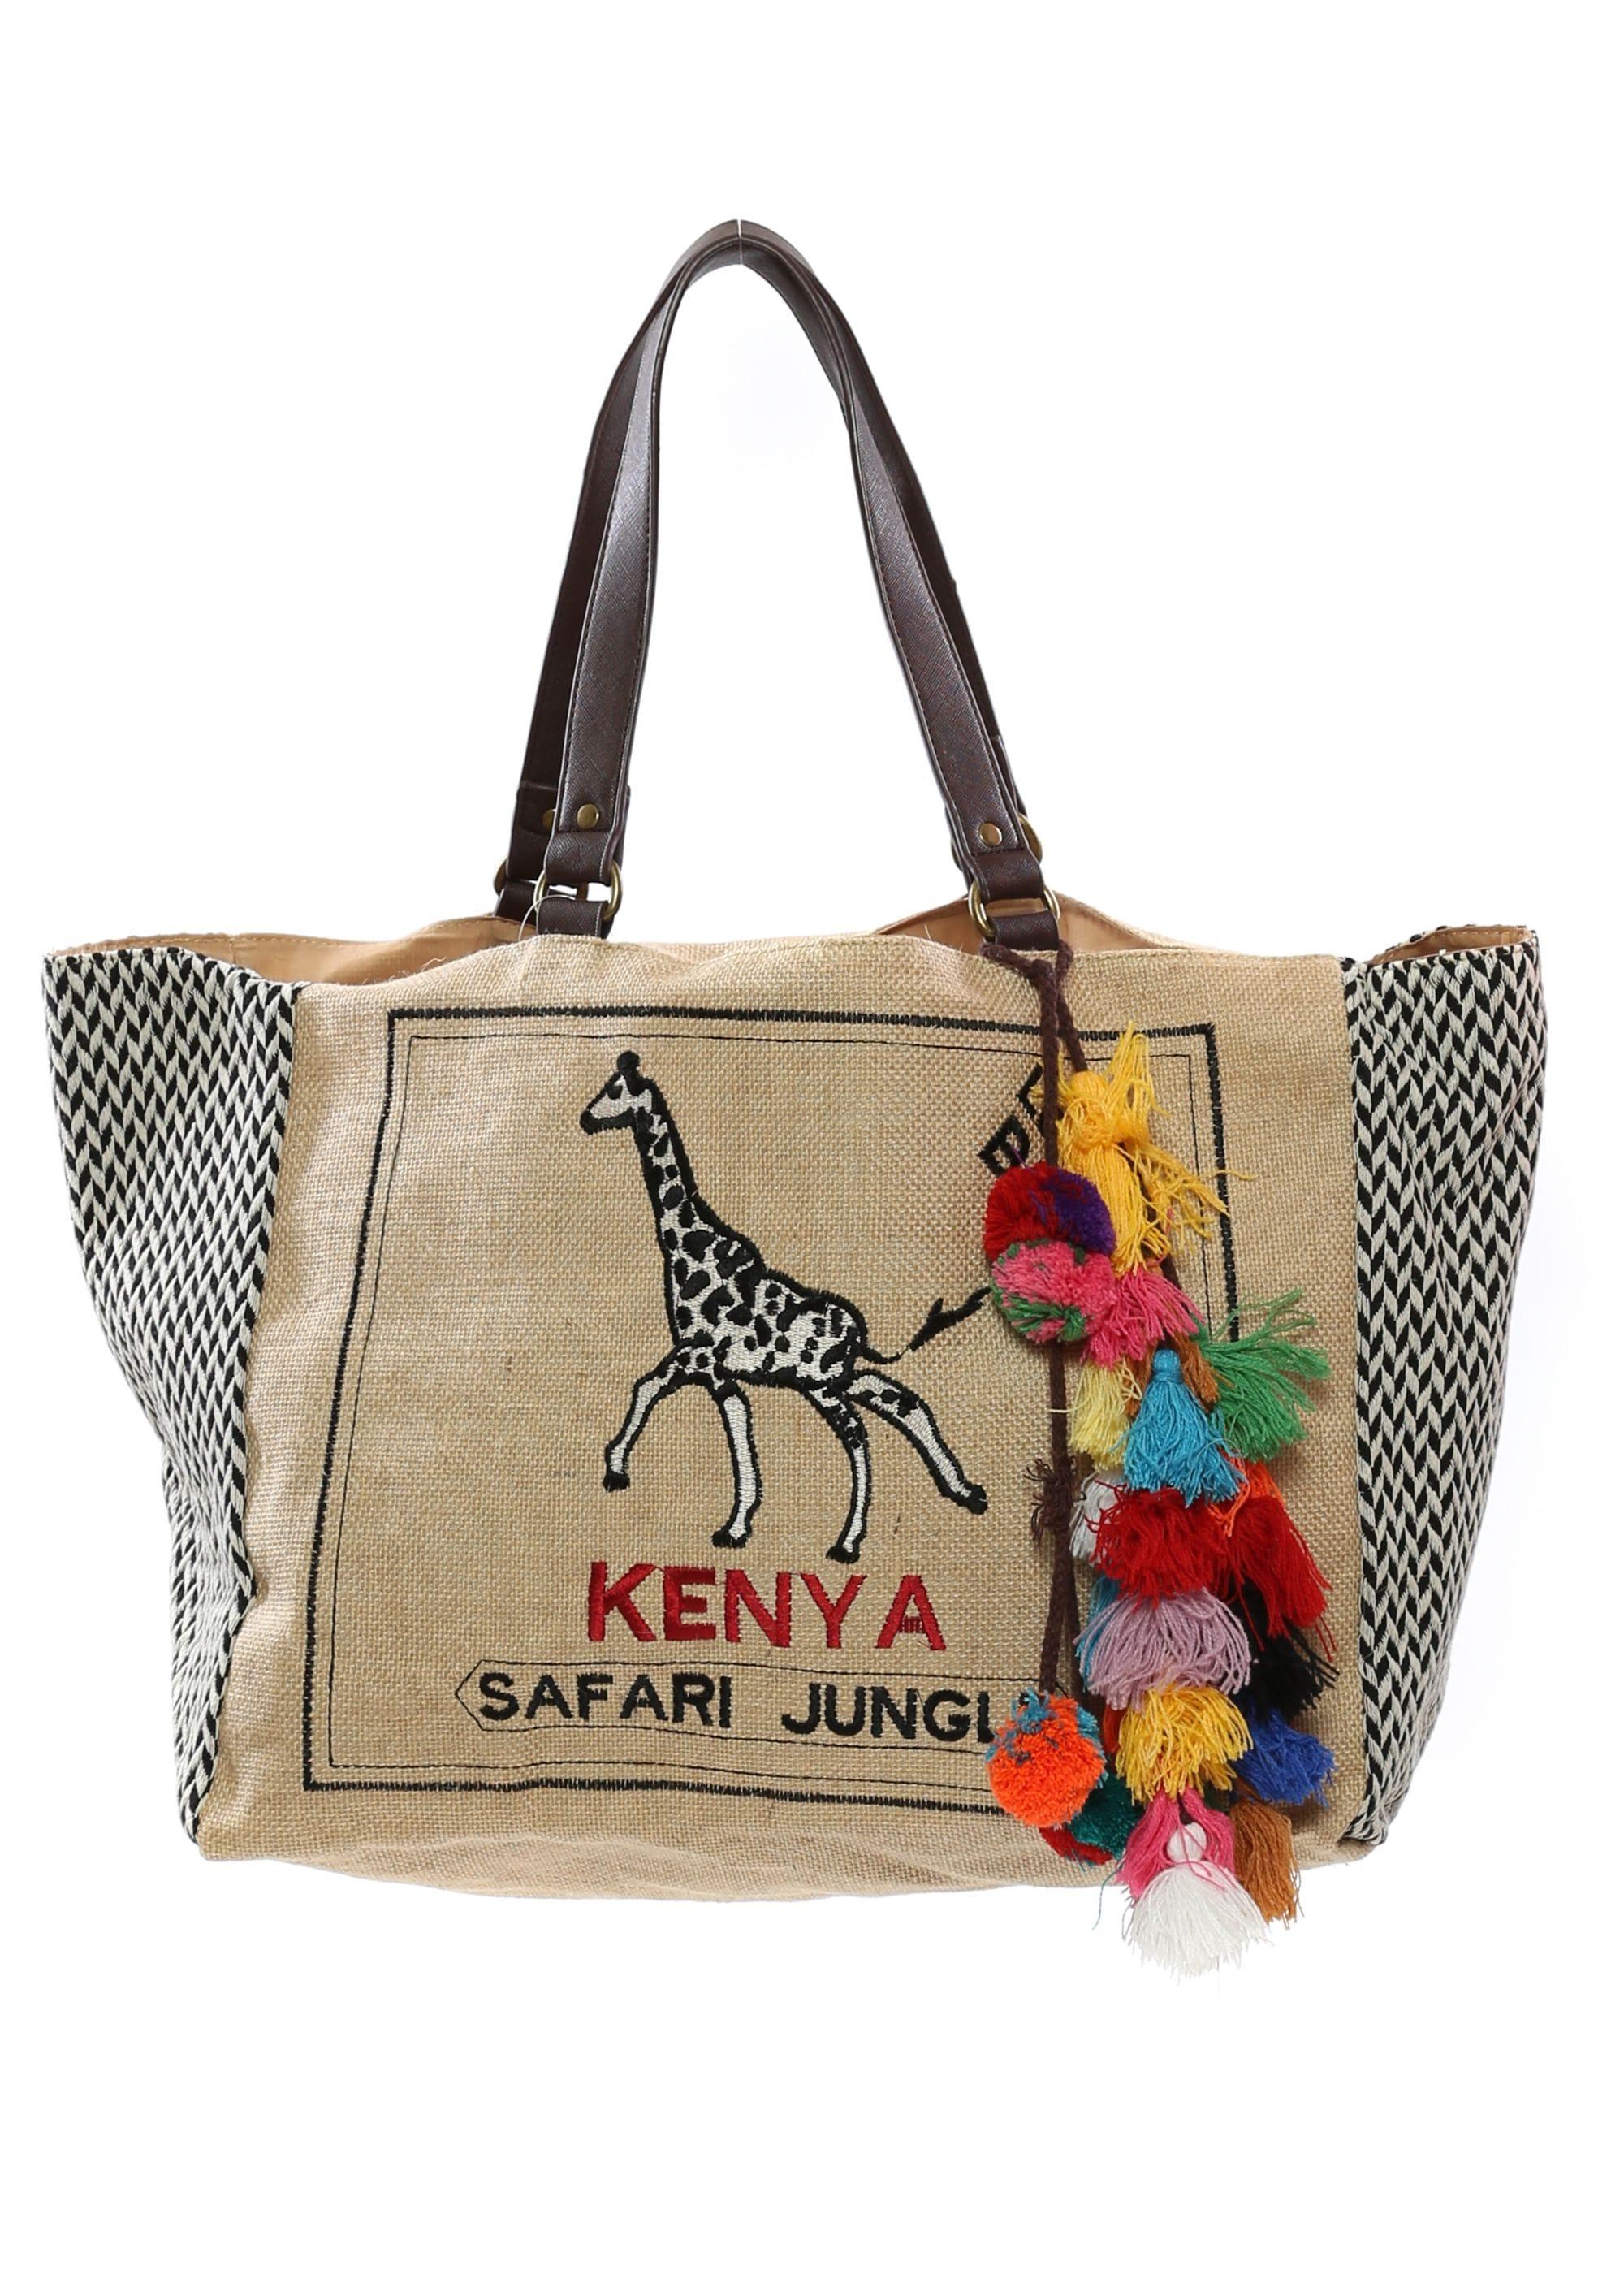 Kenya Jungle Oversized Tote Bag With Tassels